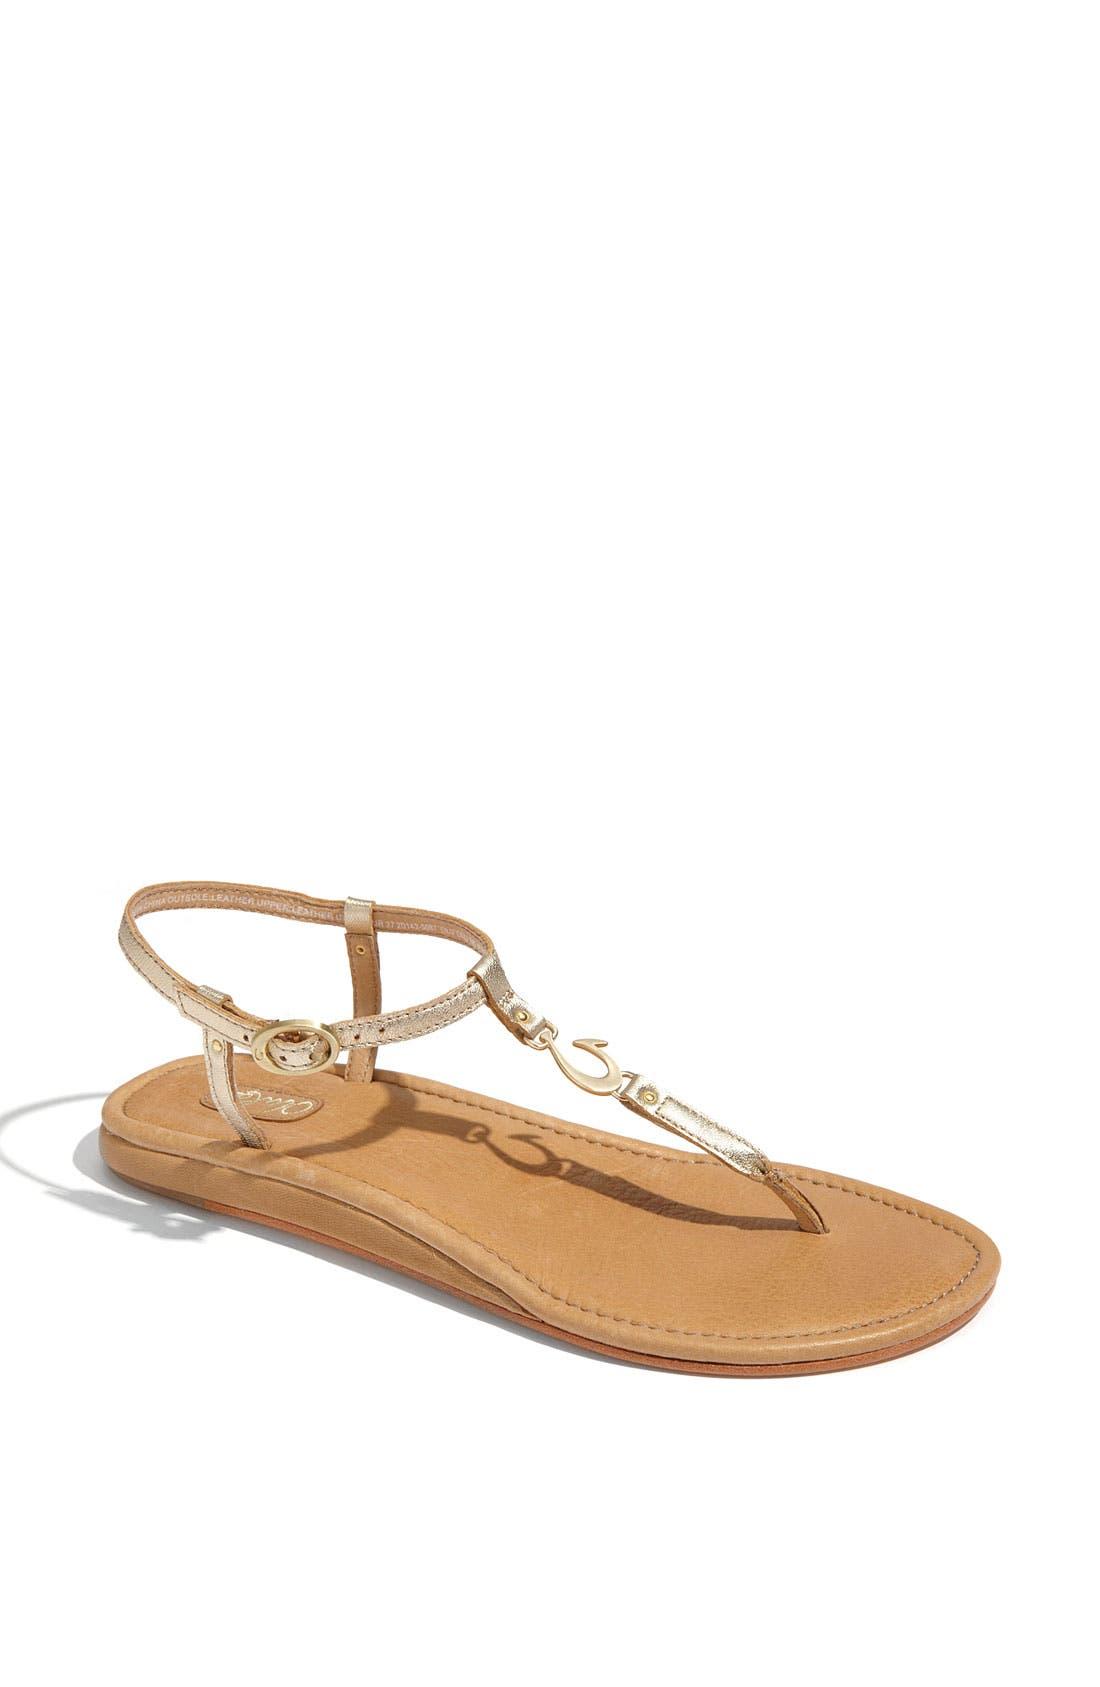 Main Image - OluKai 'Olu'Olu' Thong Sandal